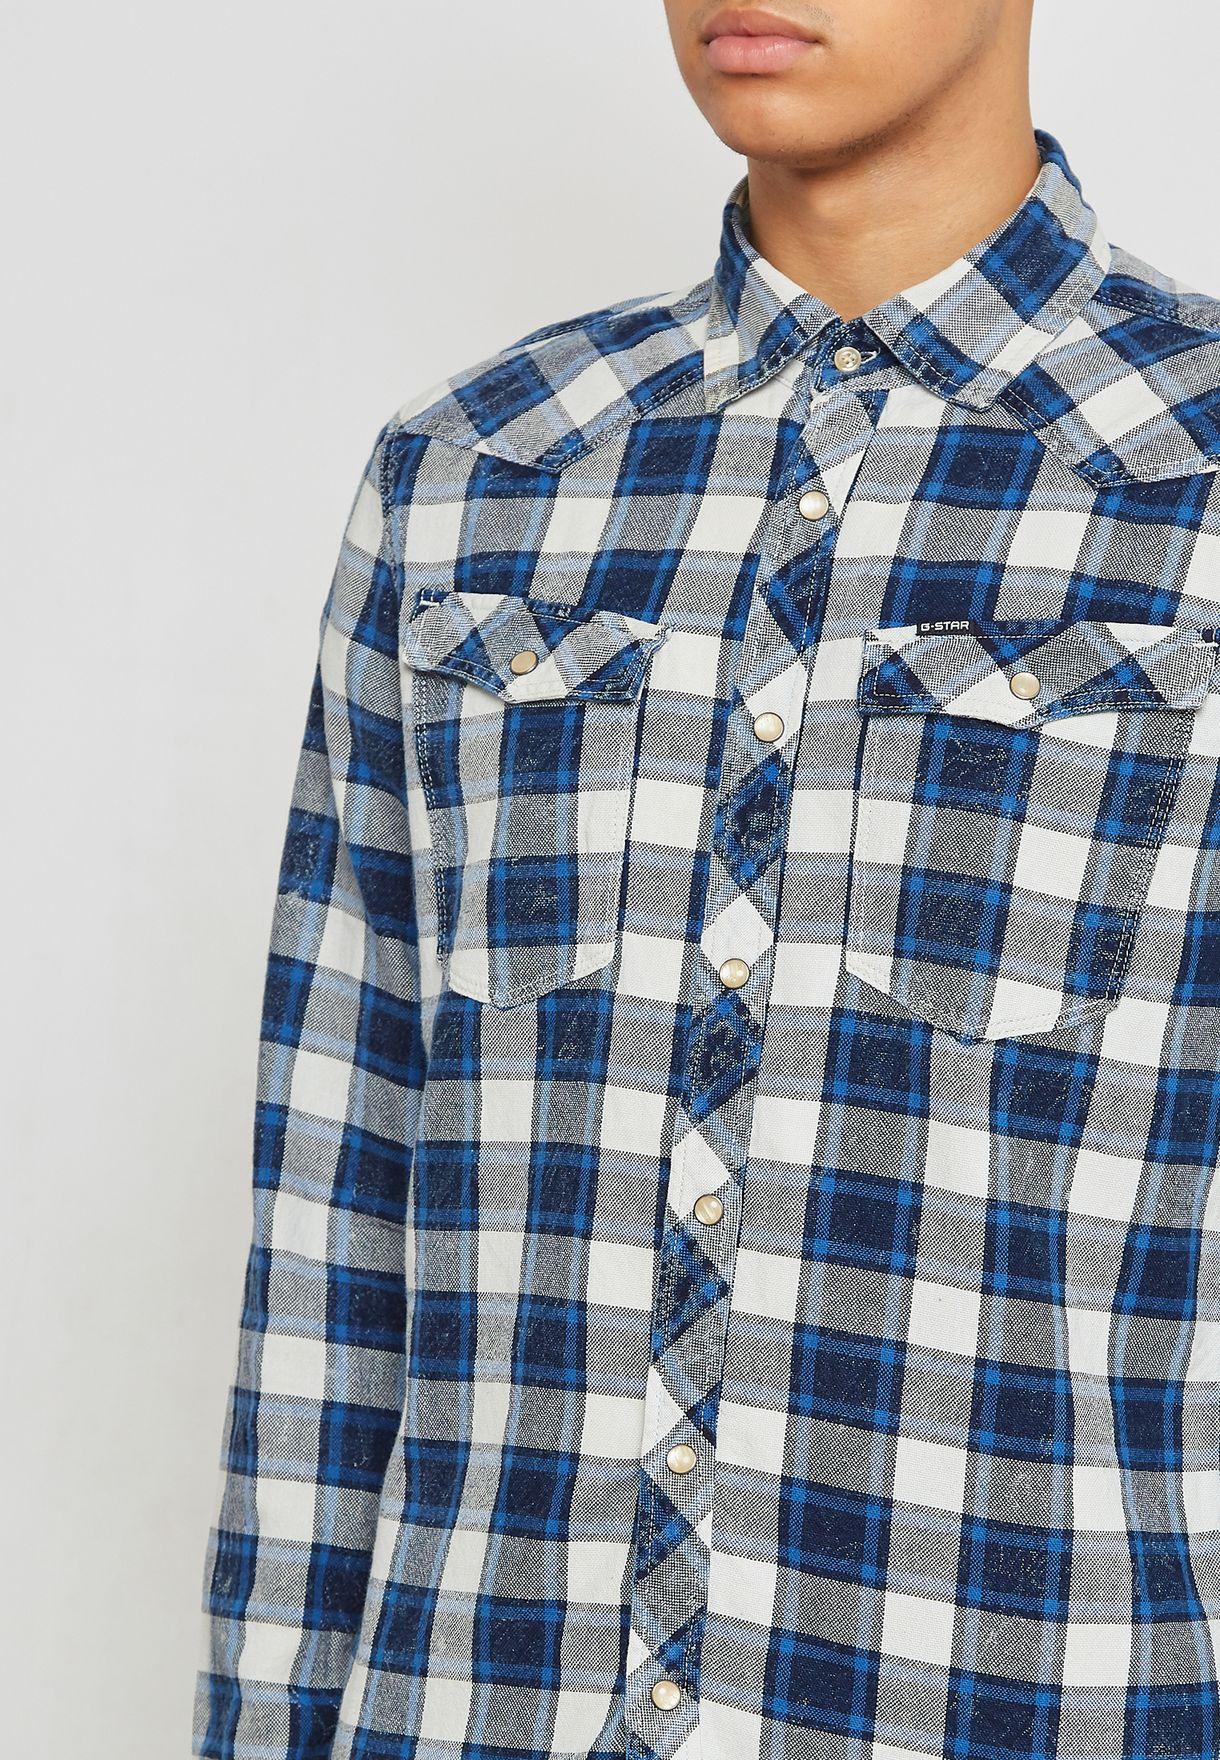 Hudson Check Shirt